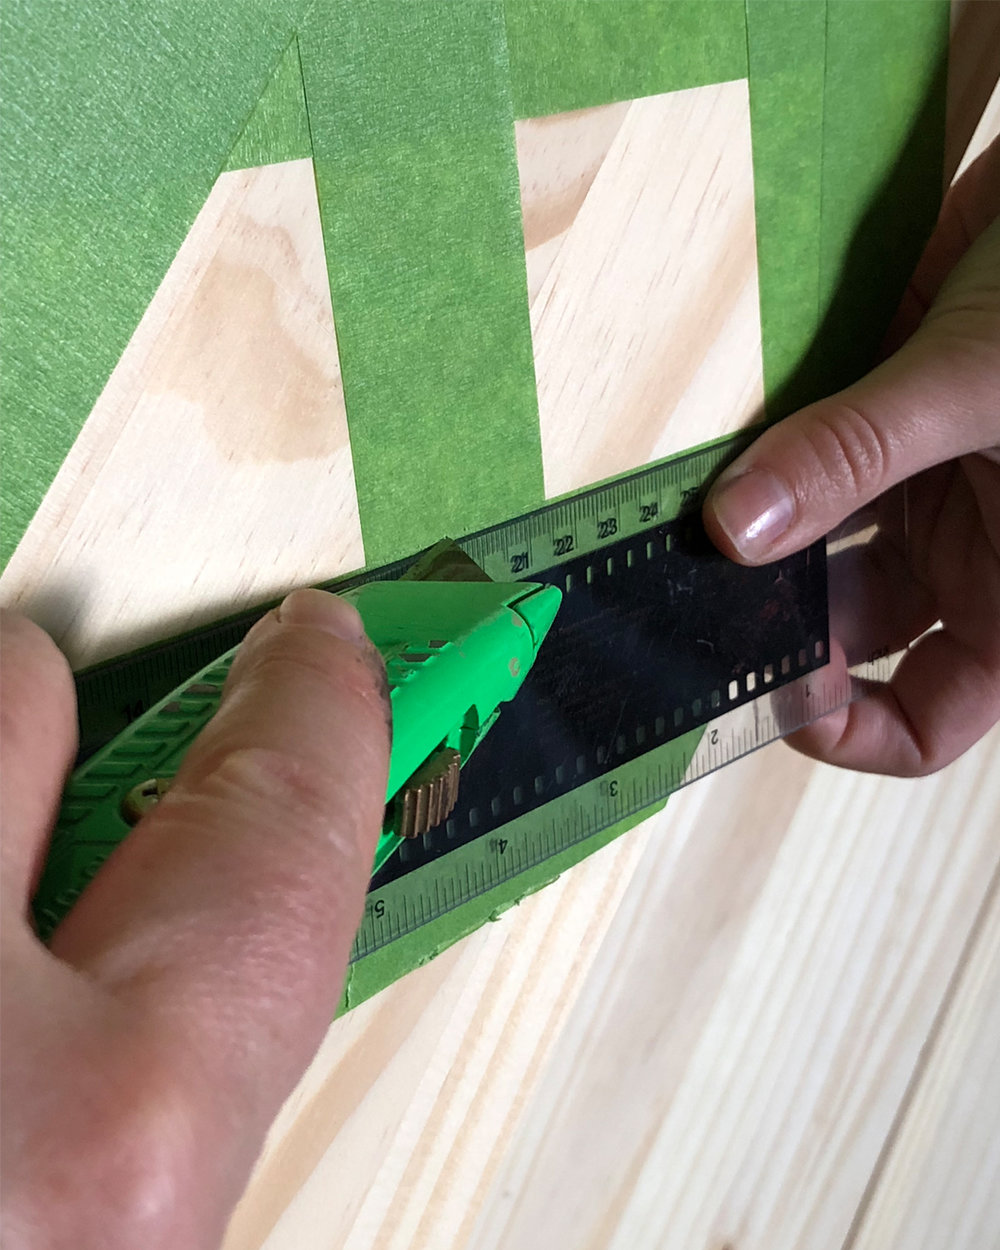 IKEA dresser makeover, dresser makeover, do it yourself dresser makeover, furniture makeover, DIY chalk paint IKEA dresser, affordable DIY home projects, chalk paint DIY, how to chalk paint, how to paint an IKEA dresser, chalk paint a dresser tutorial, furniture transformation, dresser transformation, IKEA dresser transformation, how to stencil a dresser with chalk paint, chalk painting techniques, aztec home decor, painting with chalk paint, BB Frosch